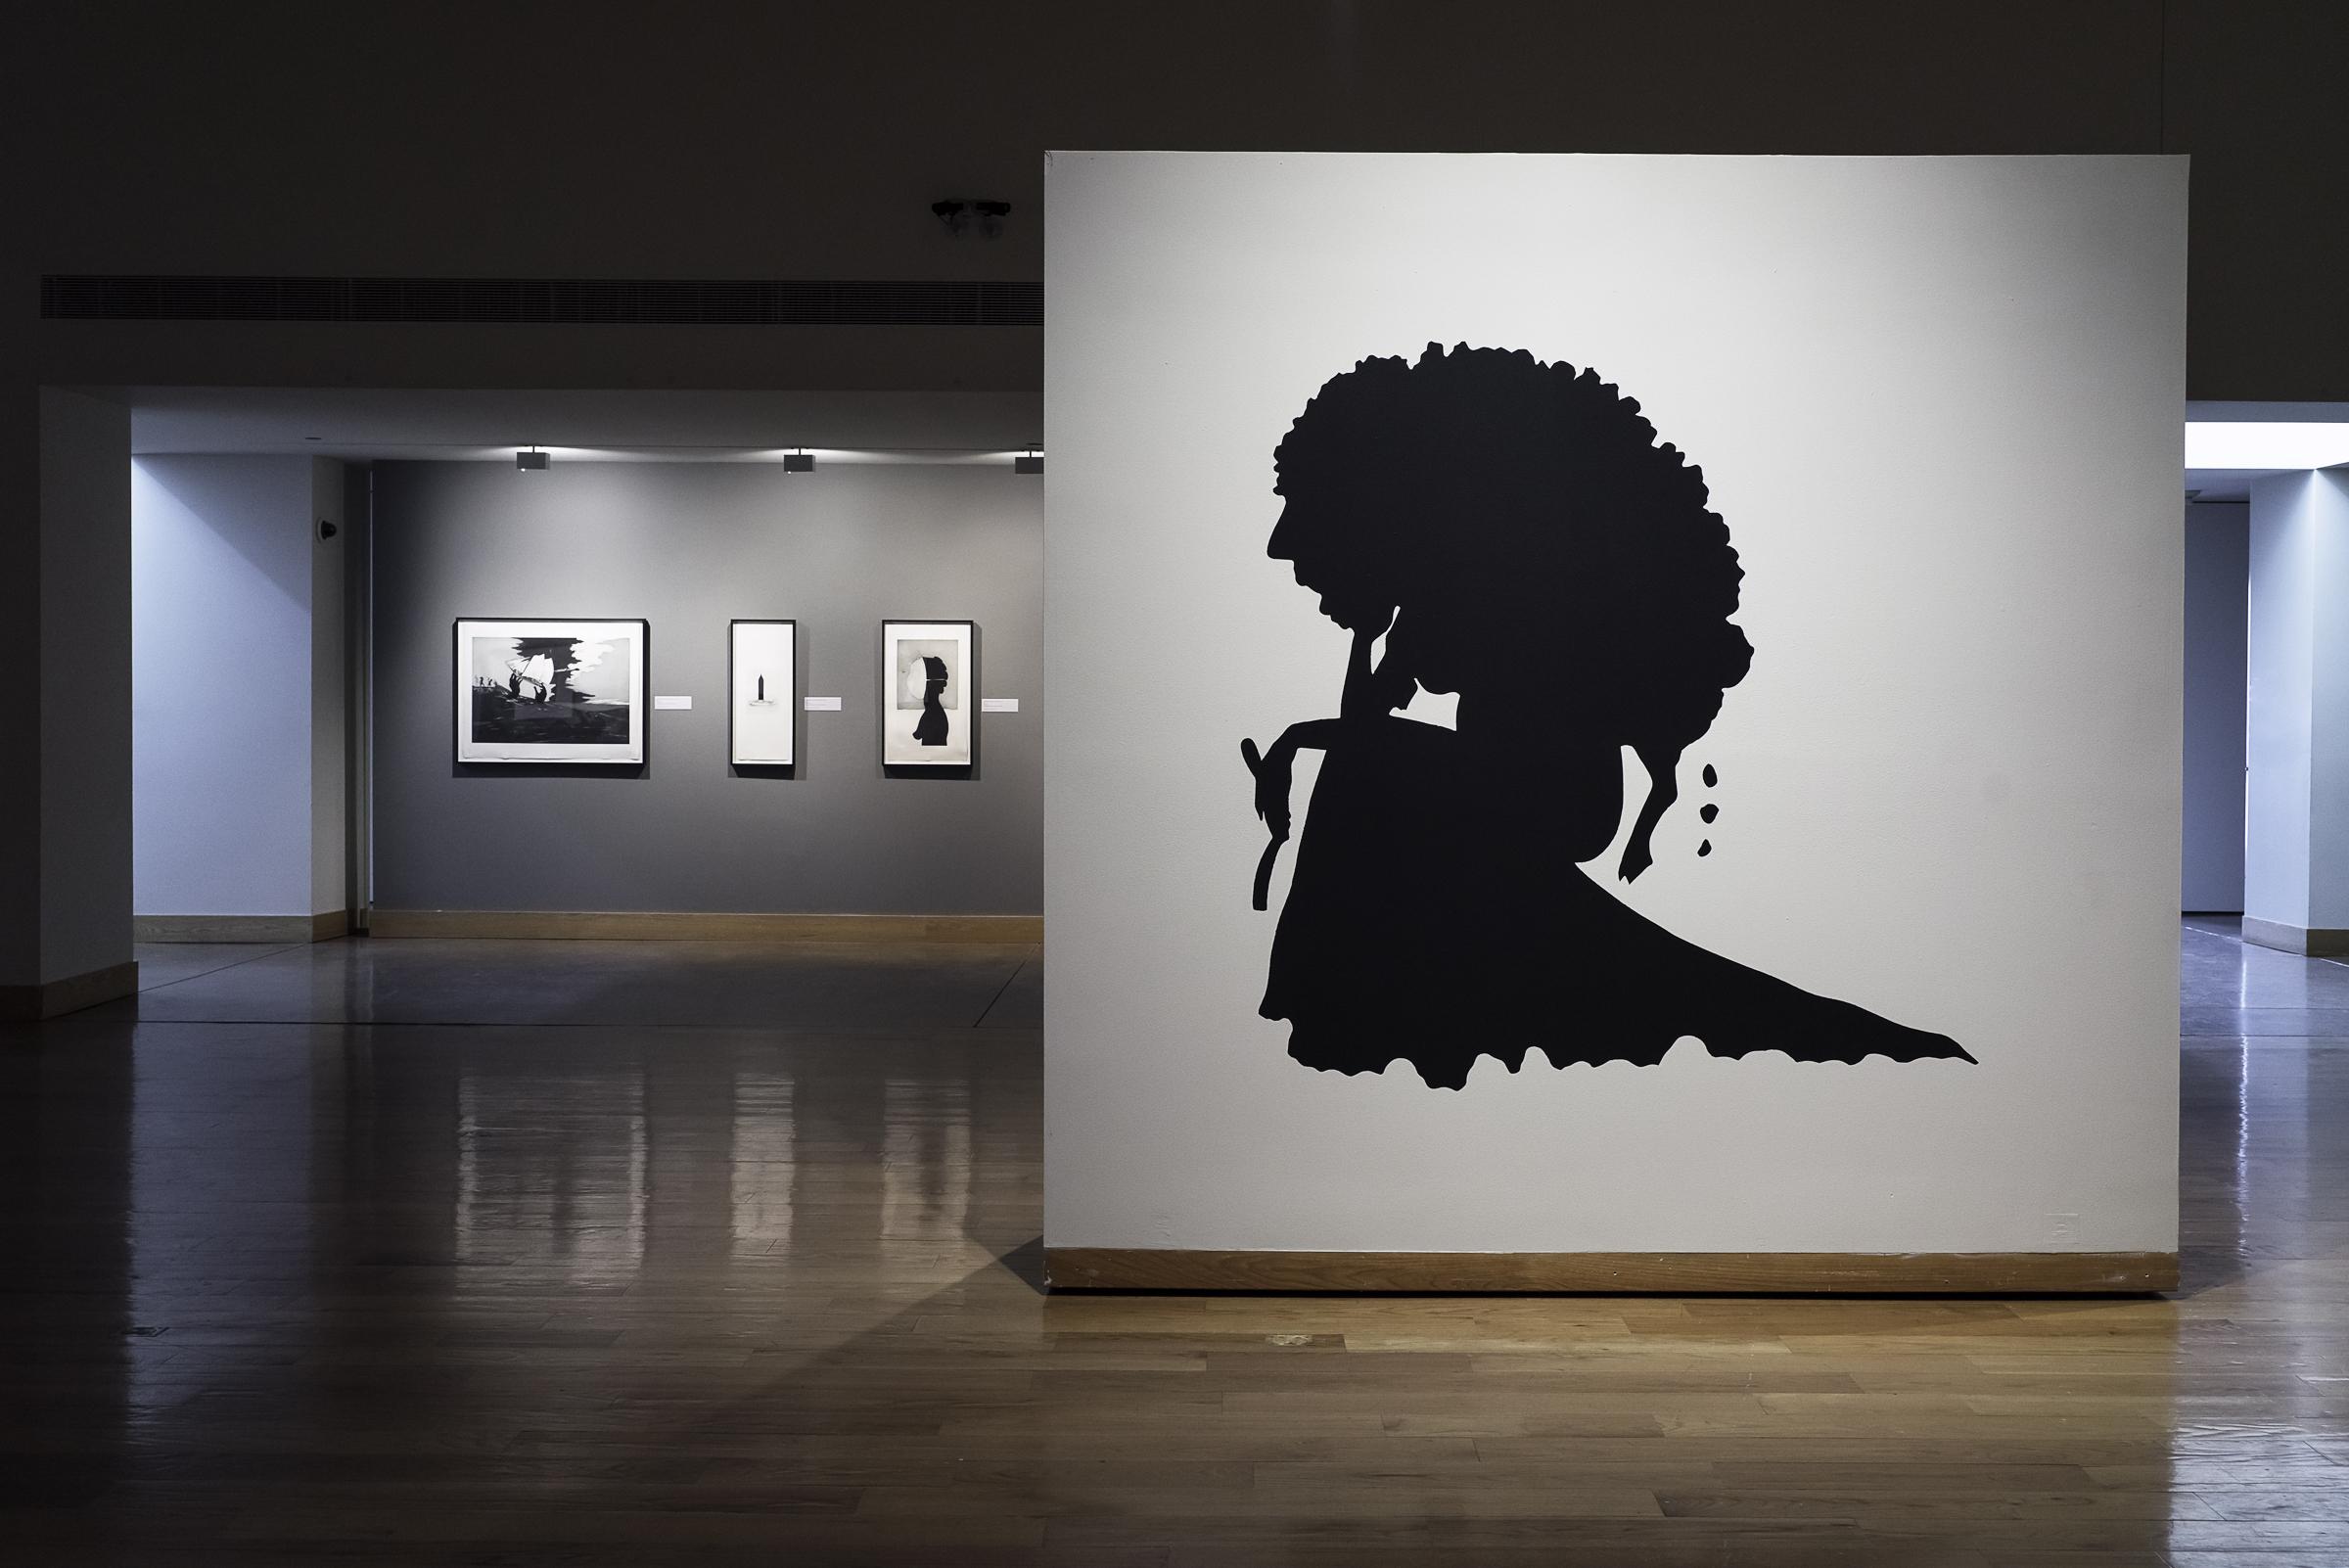 Emancipating the Past: Kara Walker's Tales of Slavery and Power